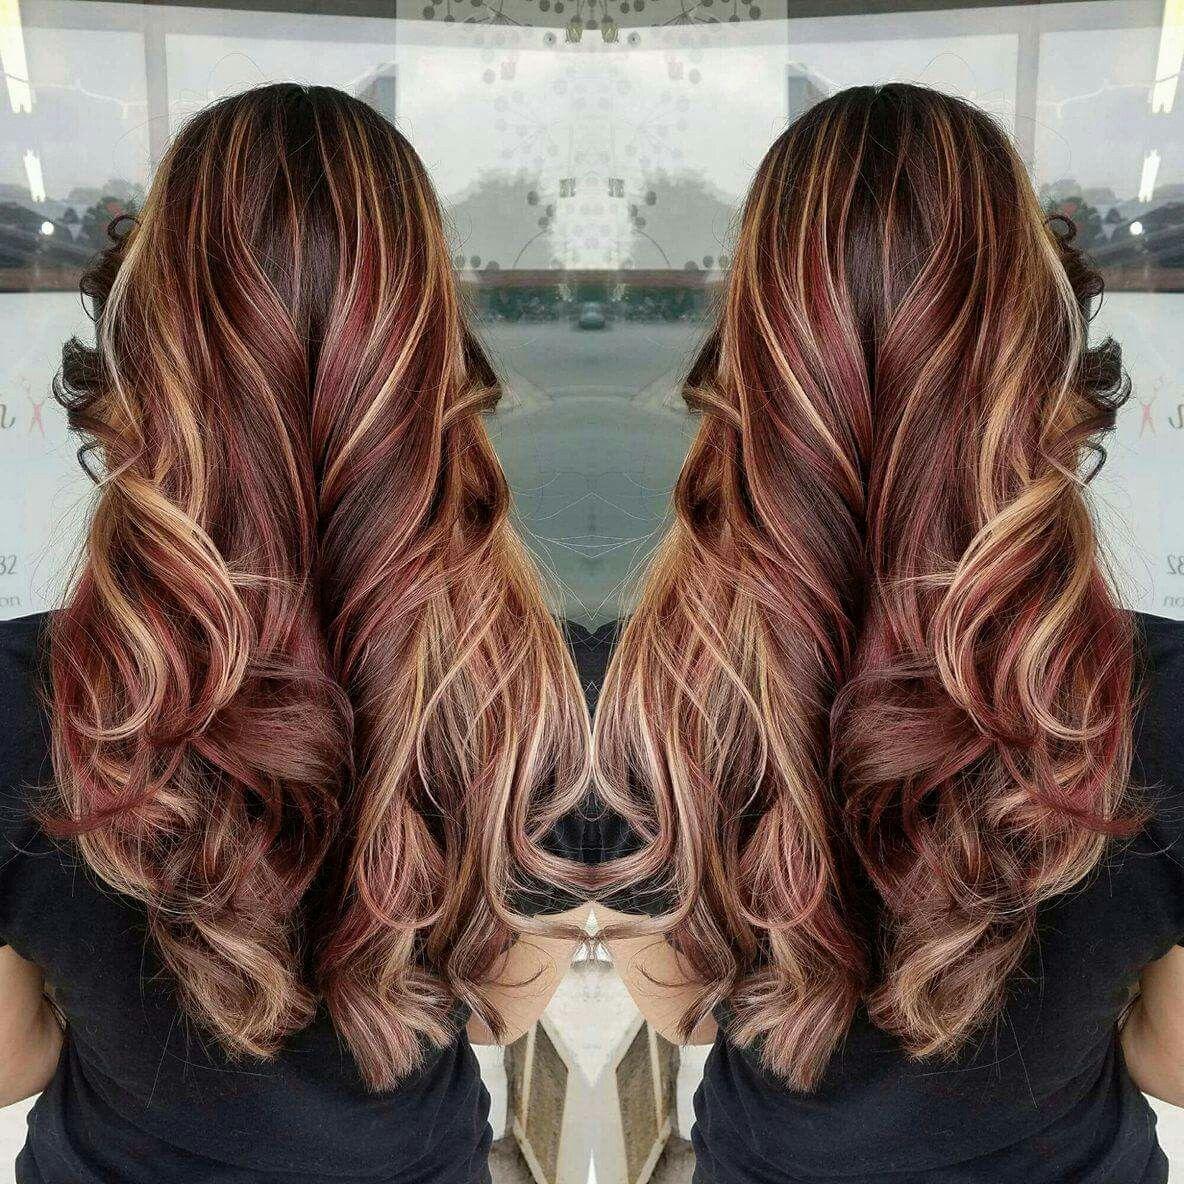 Red Hair Brown Hair Blonde Highlights Burgundy Hair In 2020 Burgundy Blonde Hair Burgundy Hair Long Hair Styles